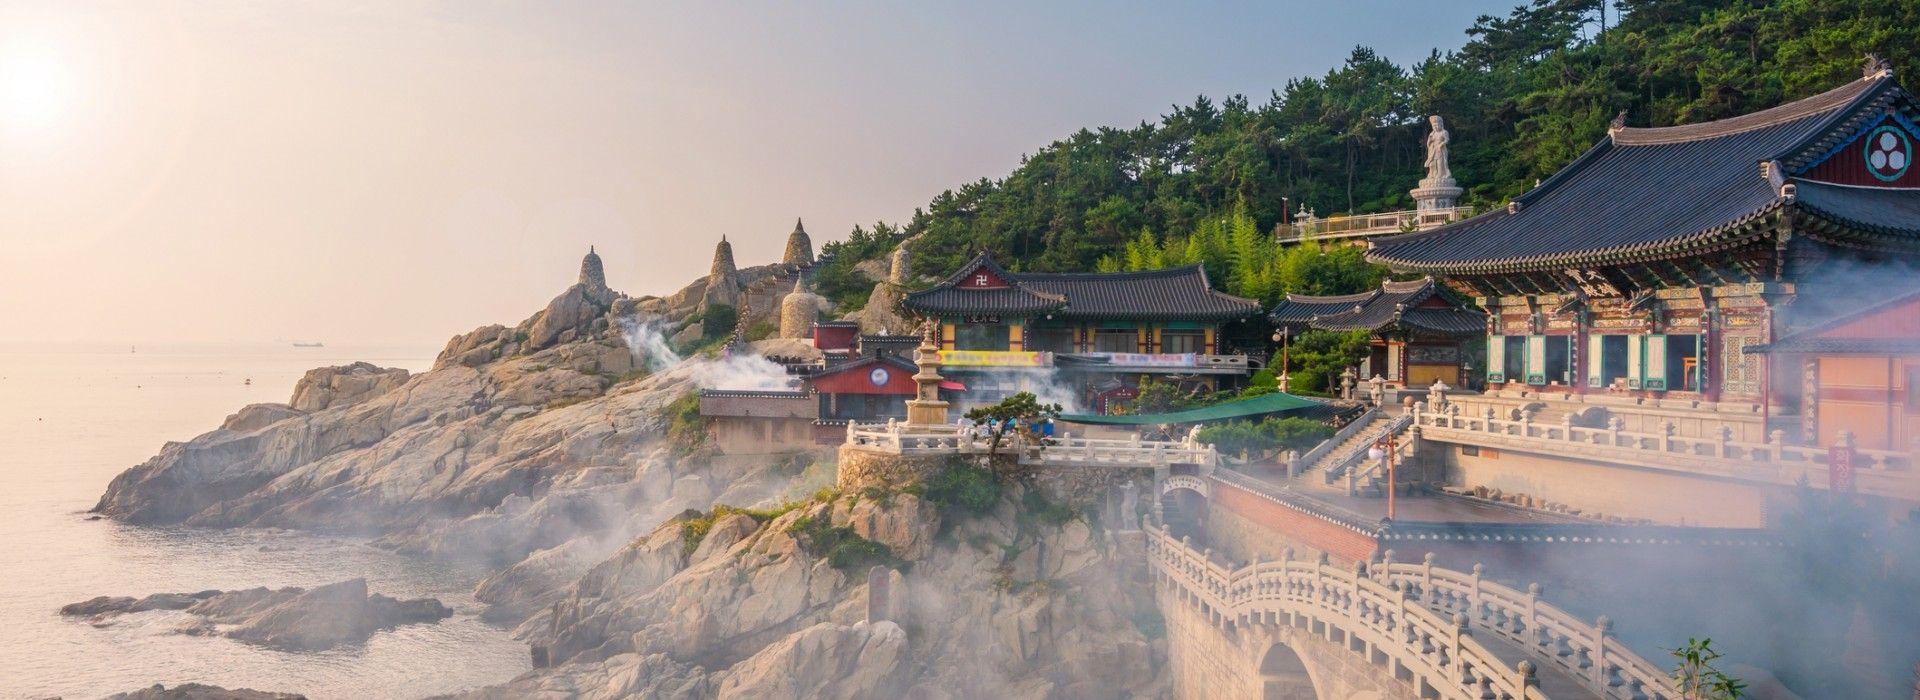 Adventure Tours in South Korea